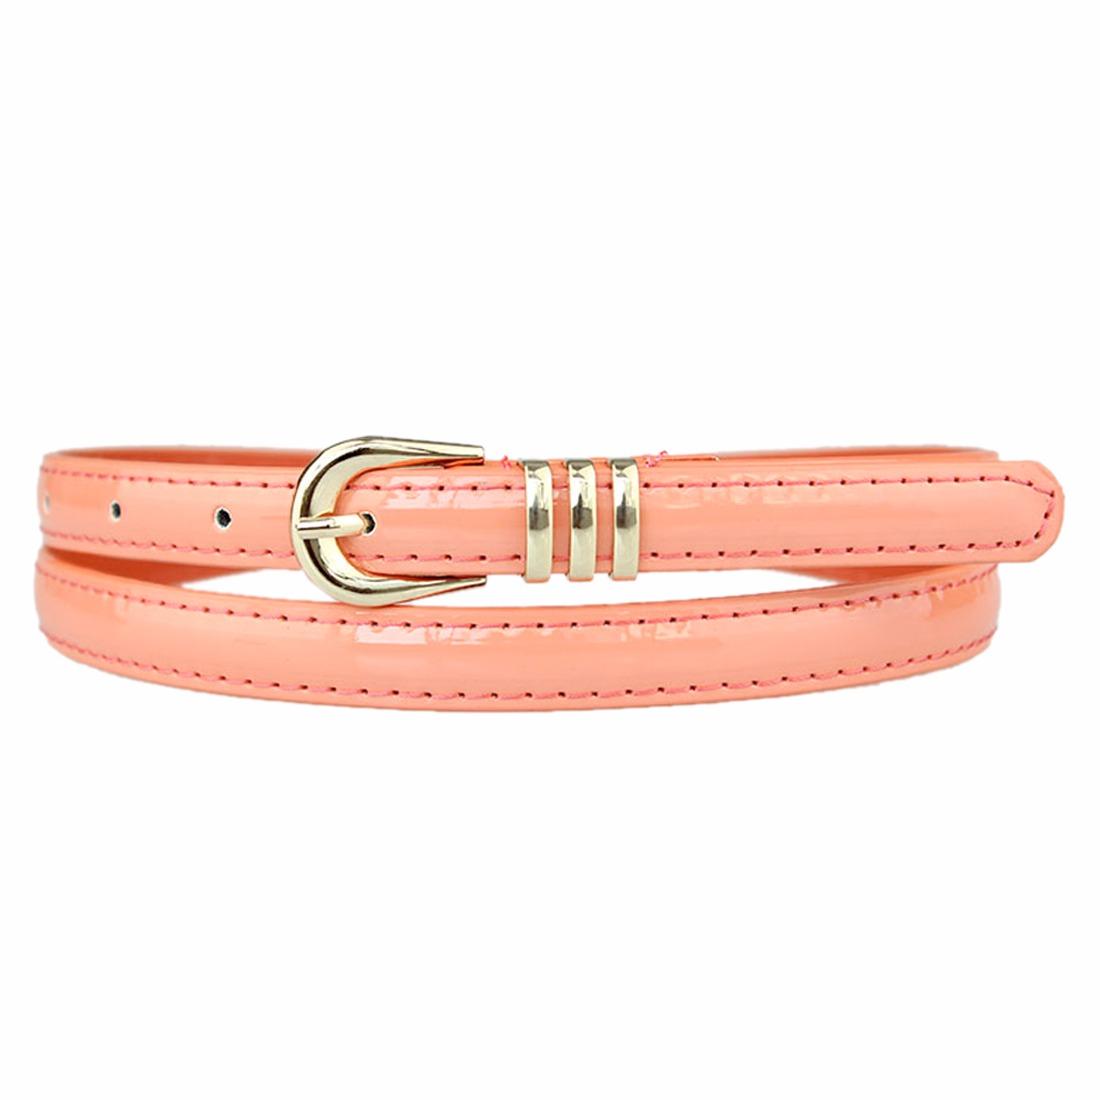 Shiny Pu Leather Pin Buckle Skinny Women Fashion Waistband Thin Waist Belt